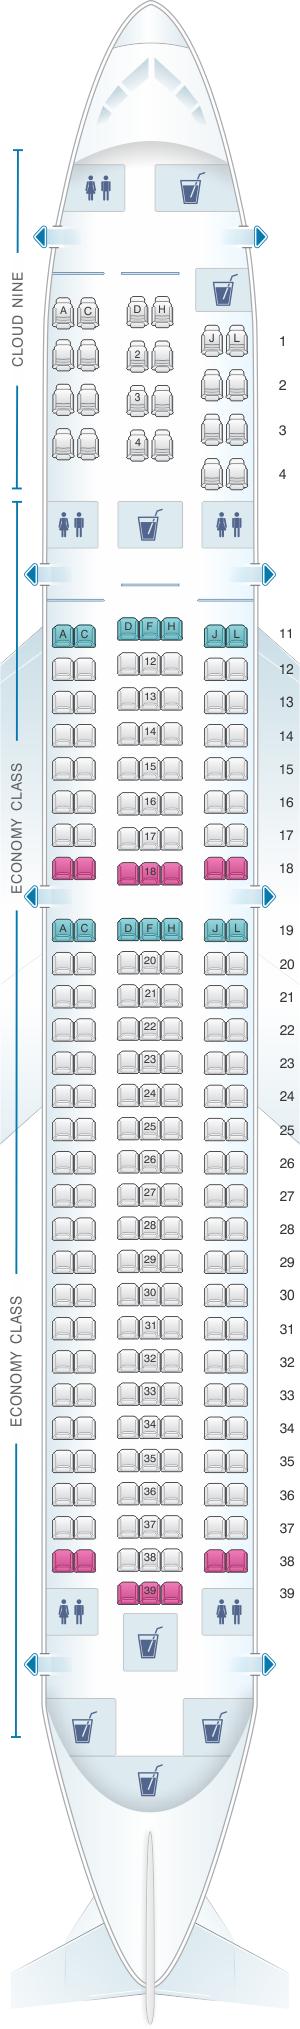 Seat map for Ethiopian Boeing B767 300ER